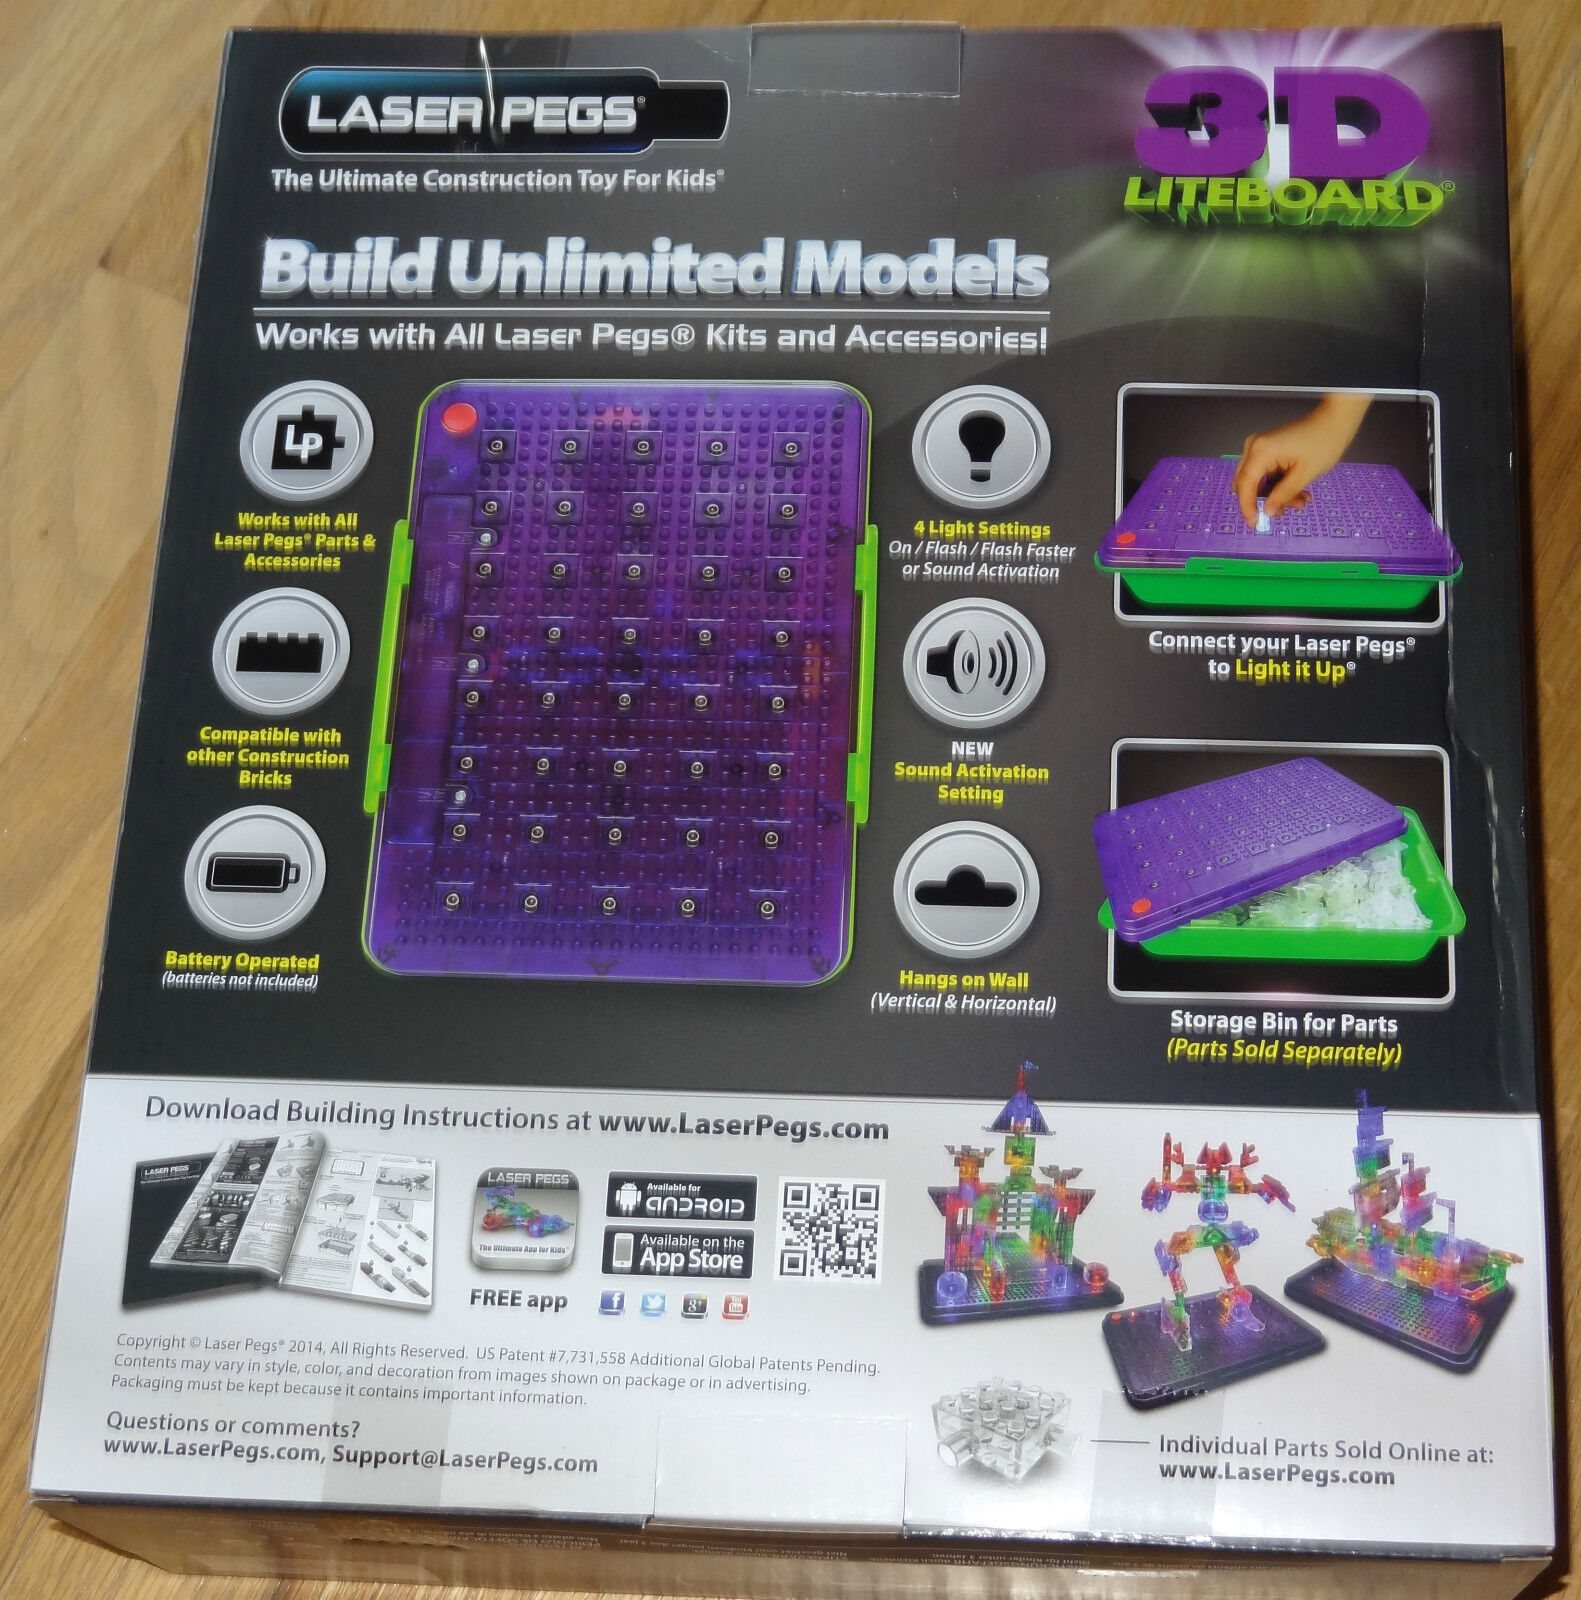 3D Liteboard Sound Activated Power Base /& Storage Bin Laser Pegs Lightboard